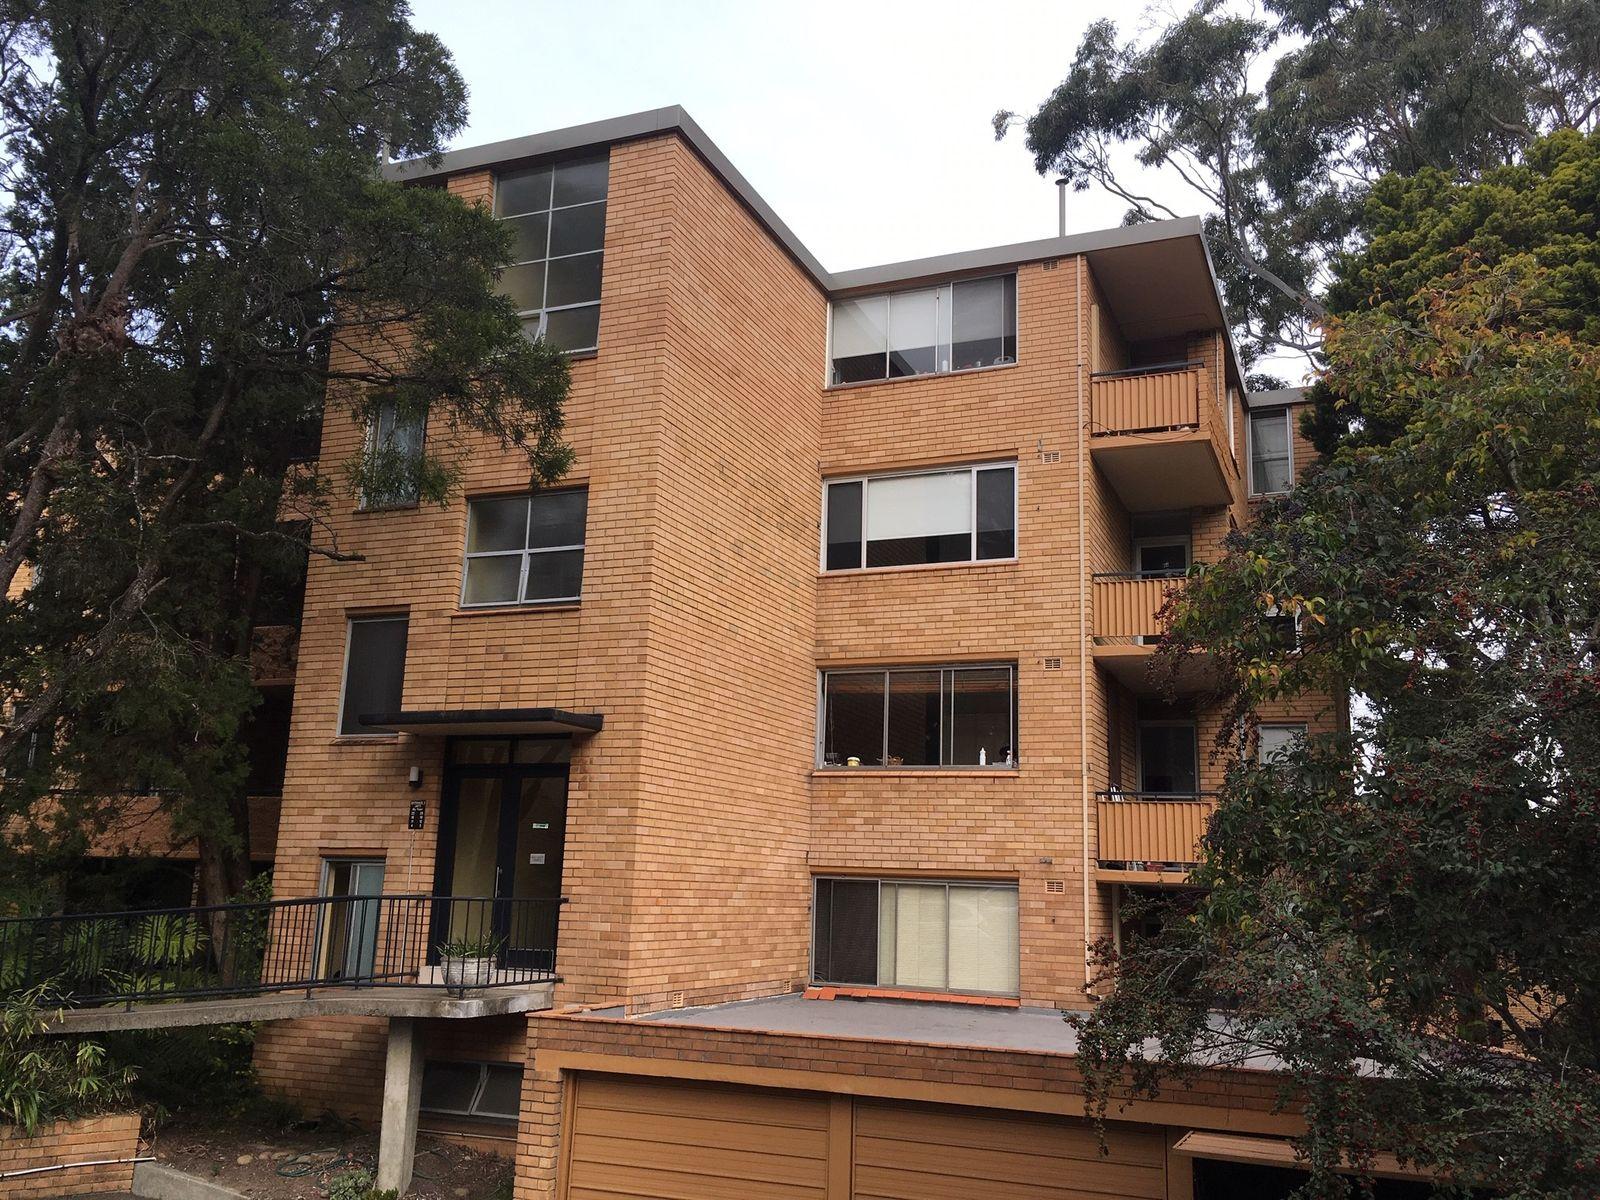 19/400 Mowbray Road, Lane Cove North, NSW 2066